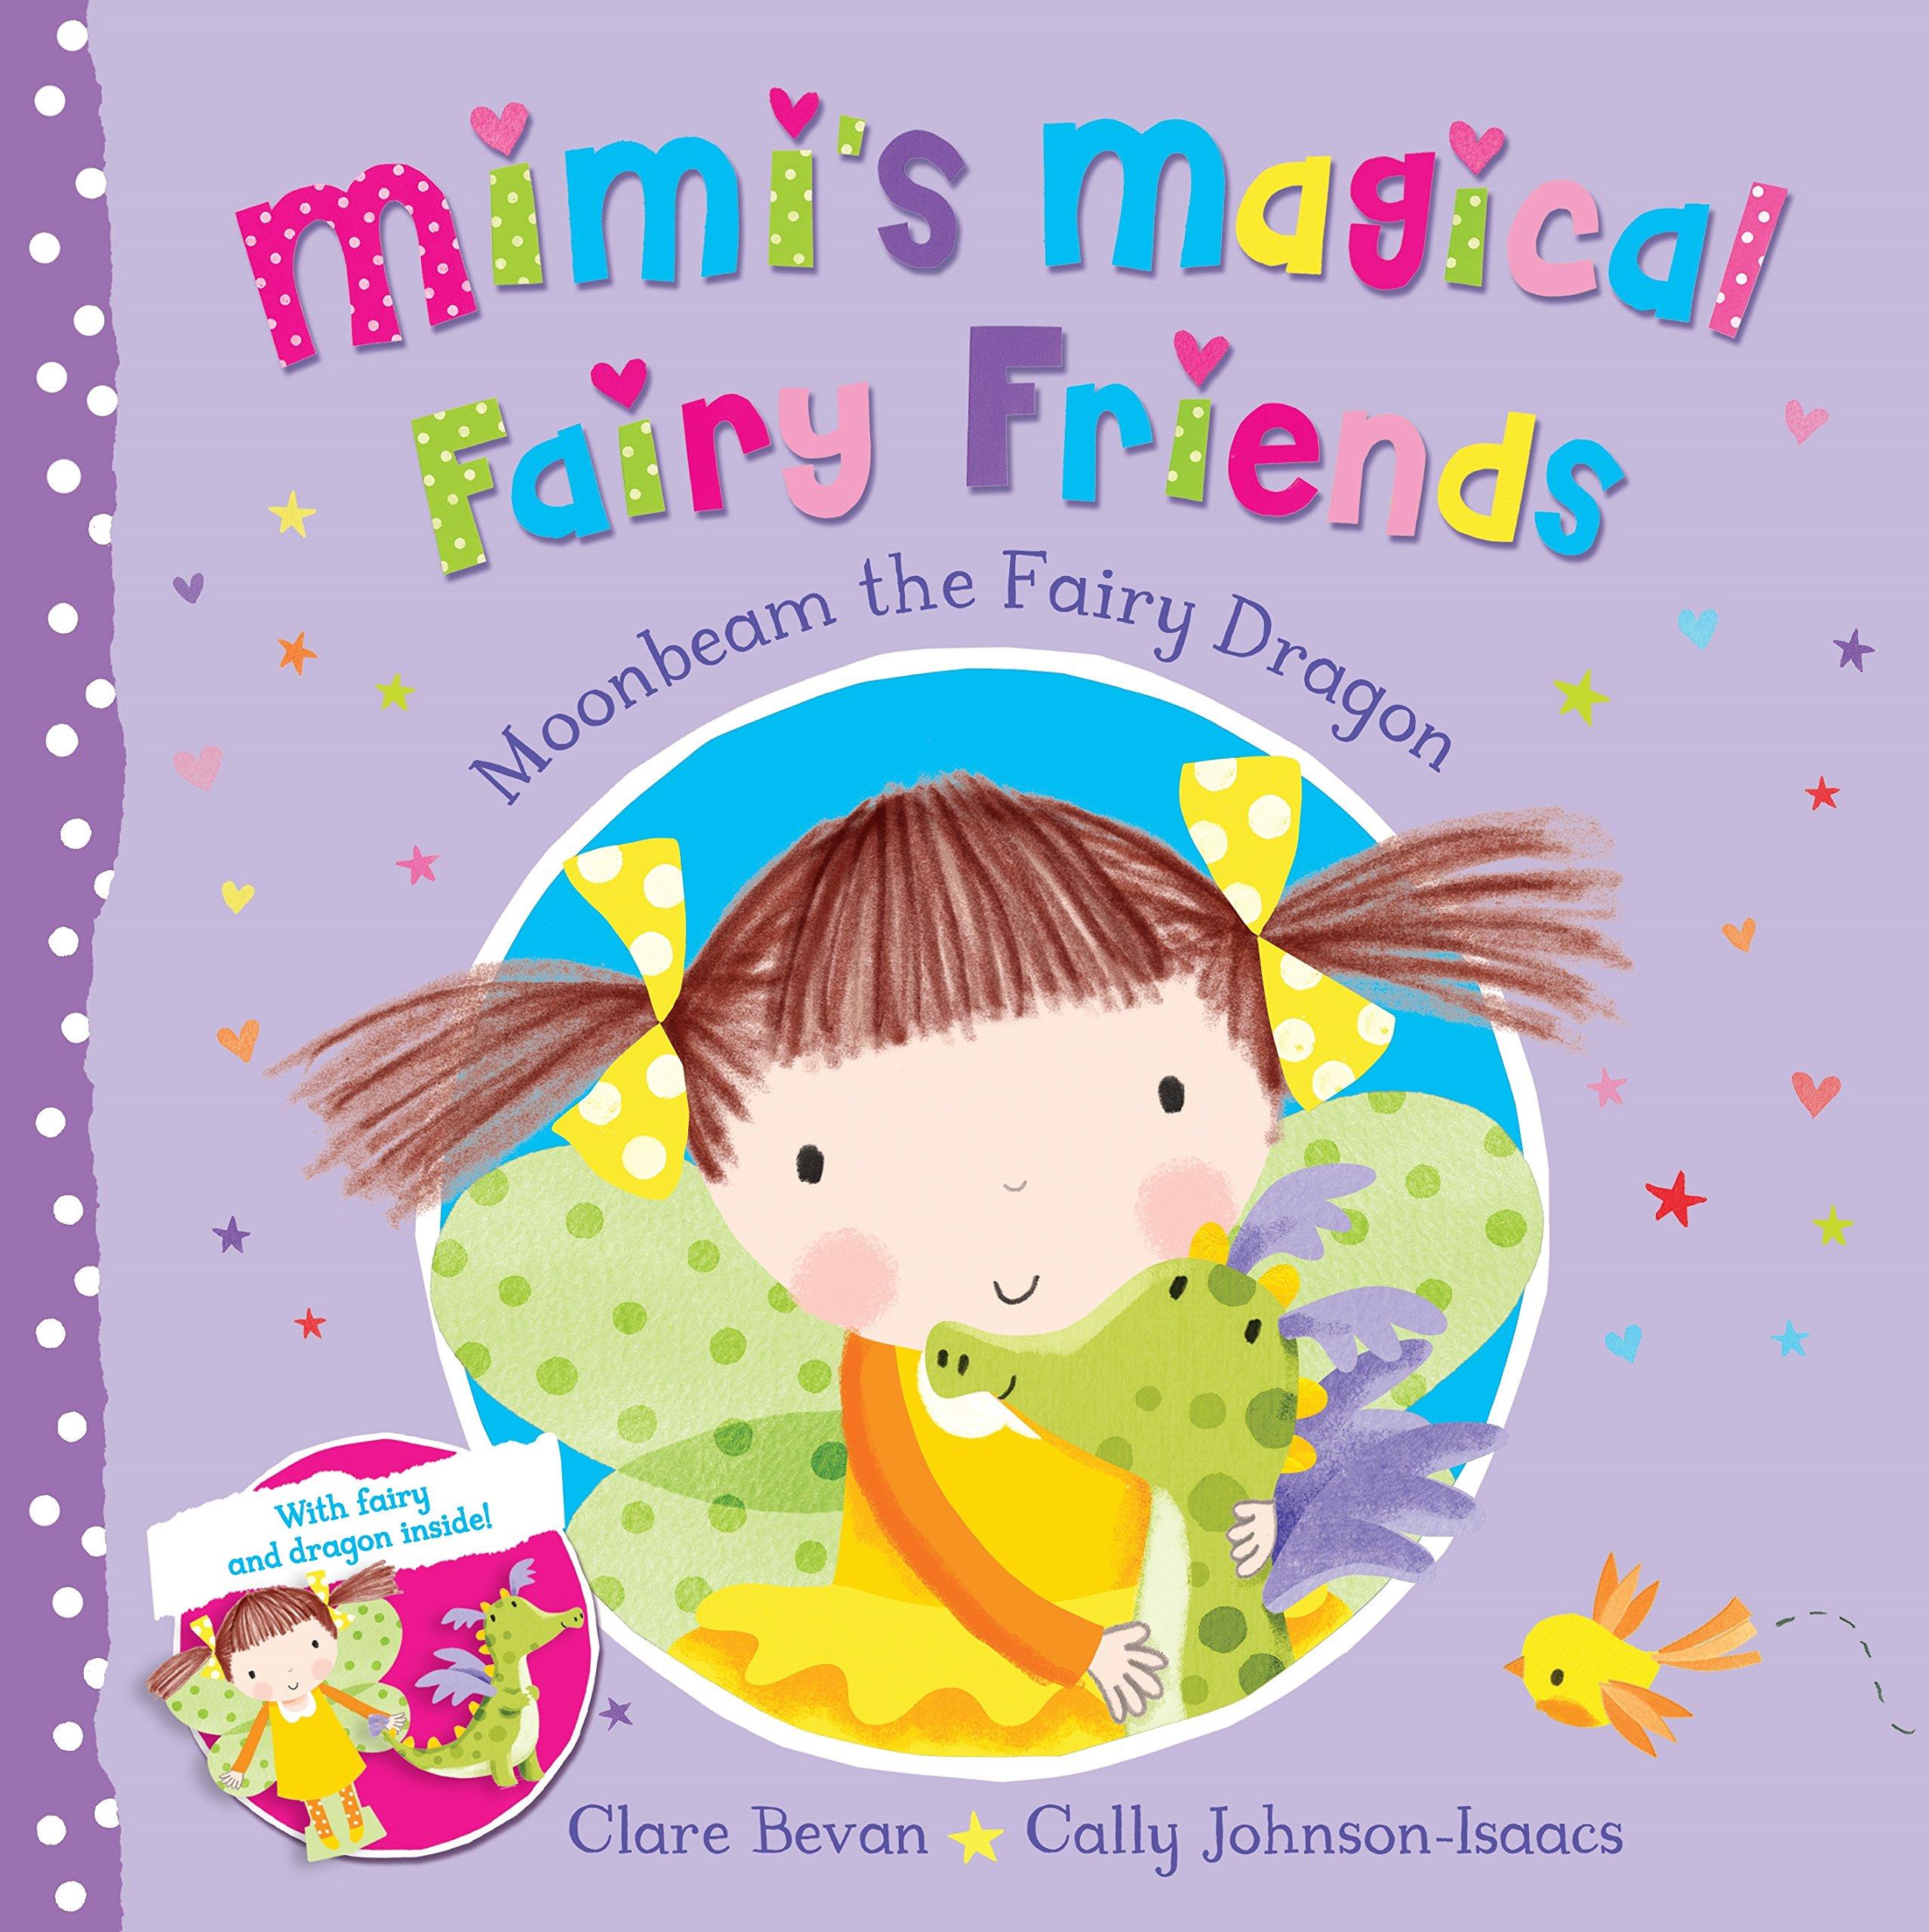 Mimi's Magical Fairy Friends: Moonbeam the Fairy Dragon funko pop vinyl фигурка dragon ball z krillin